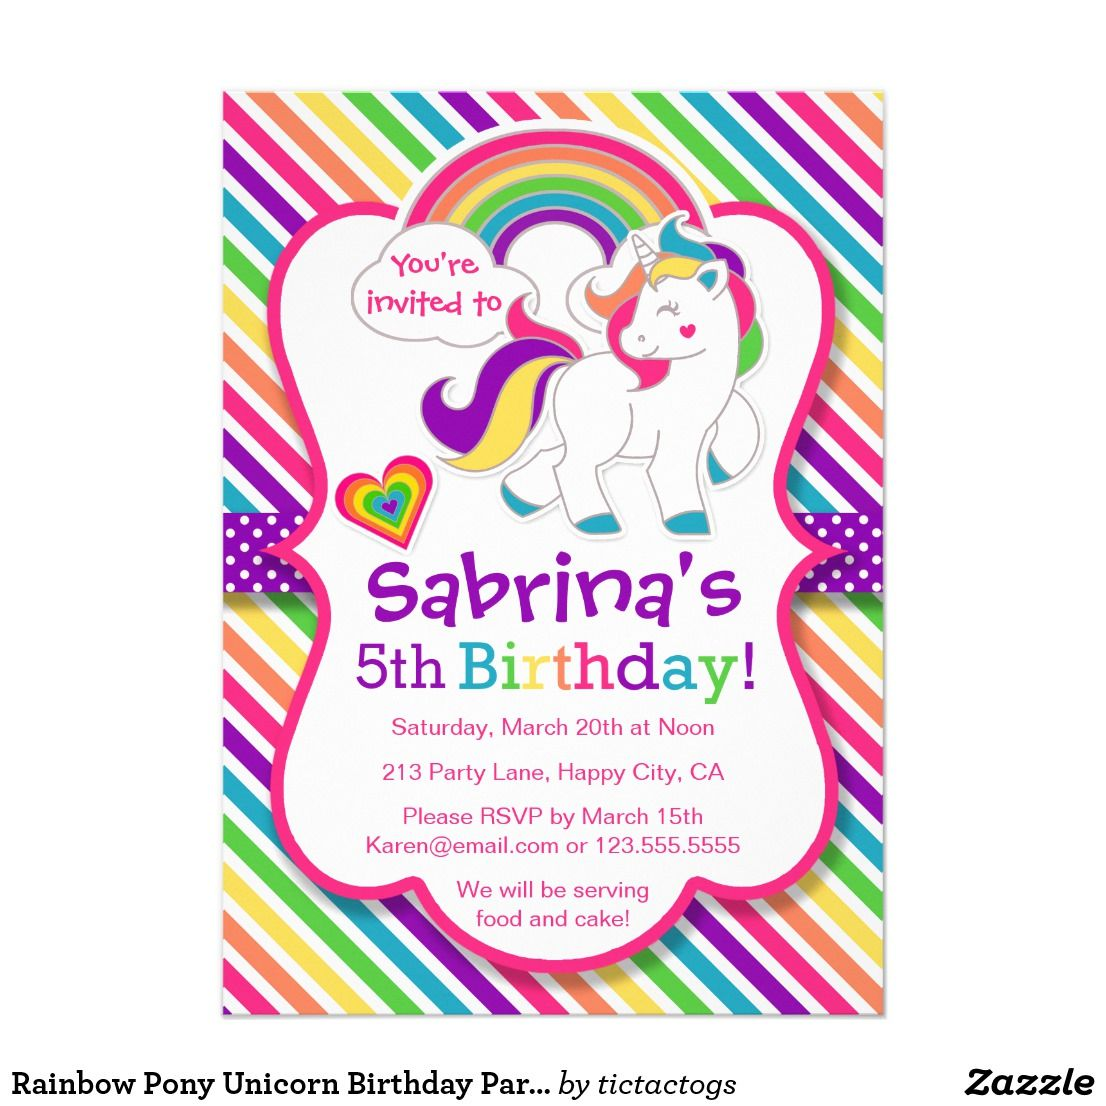 rainbow pony unicorn birthday party